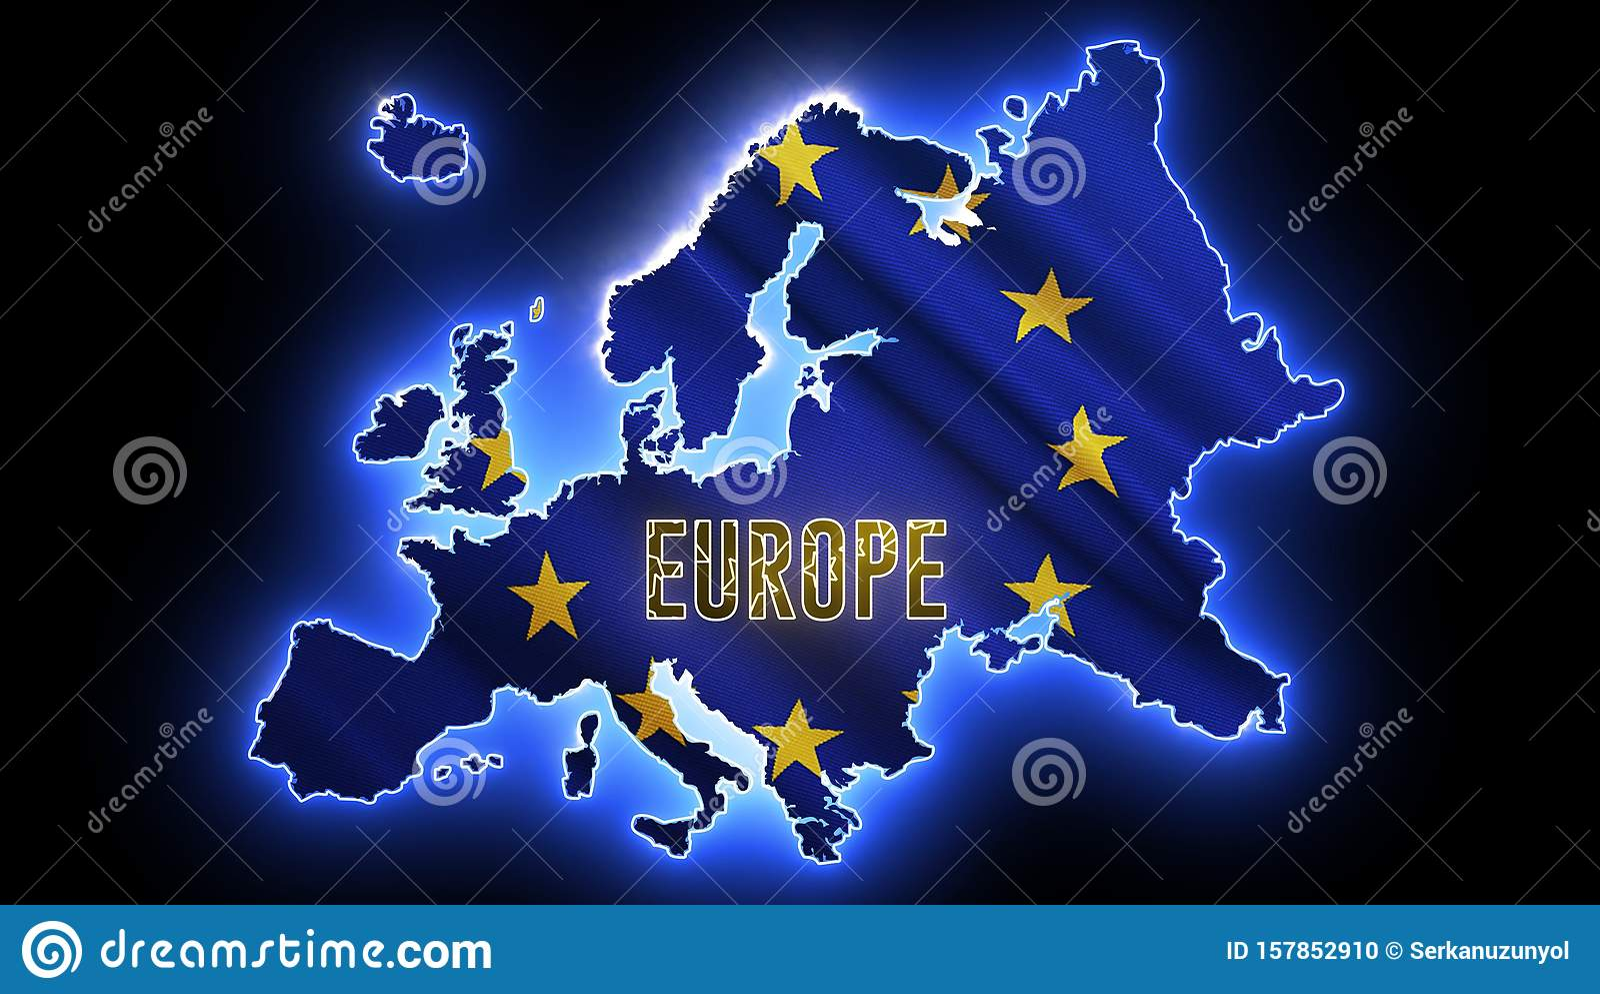 EUR-Lex - CJ - EN - EUR-Lex